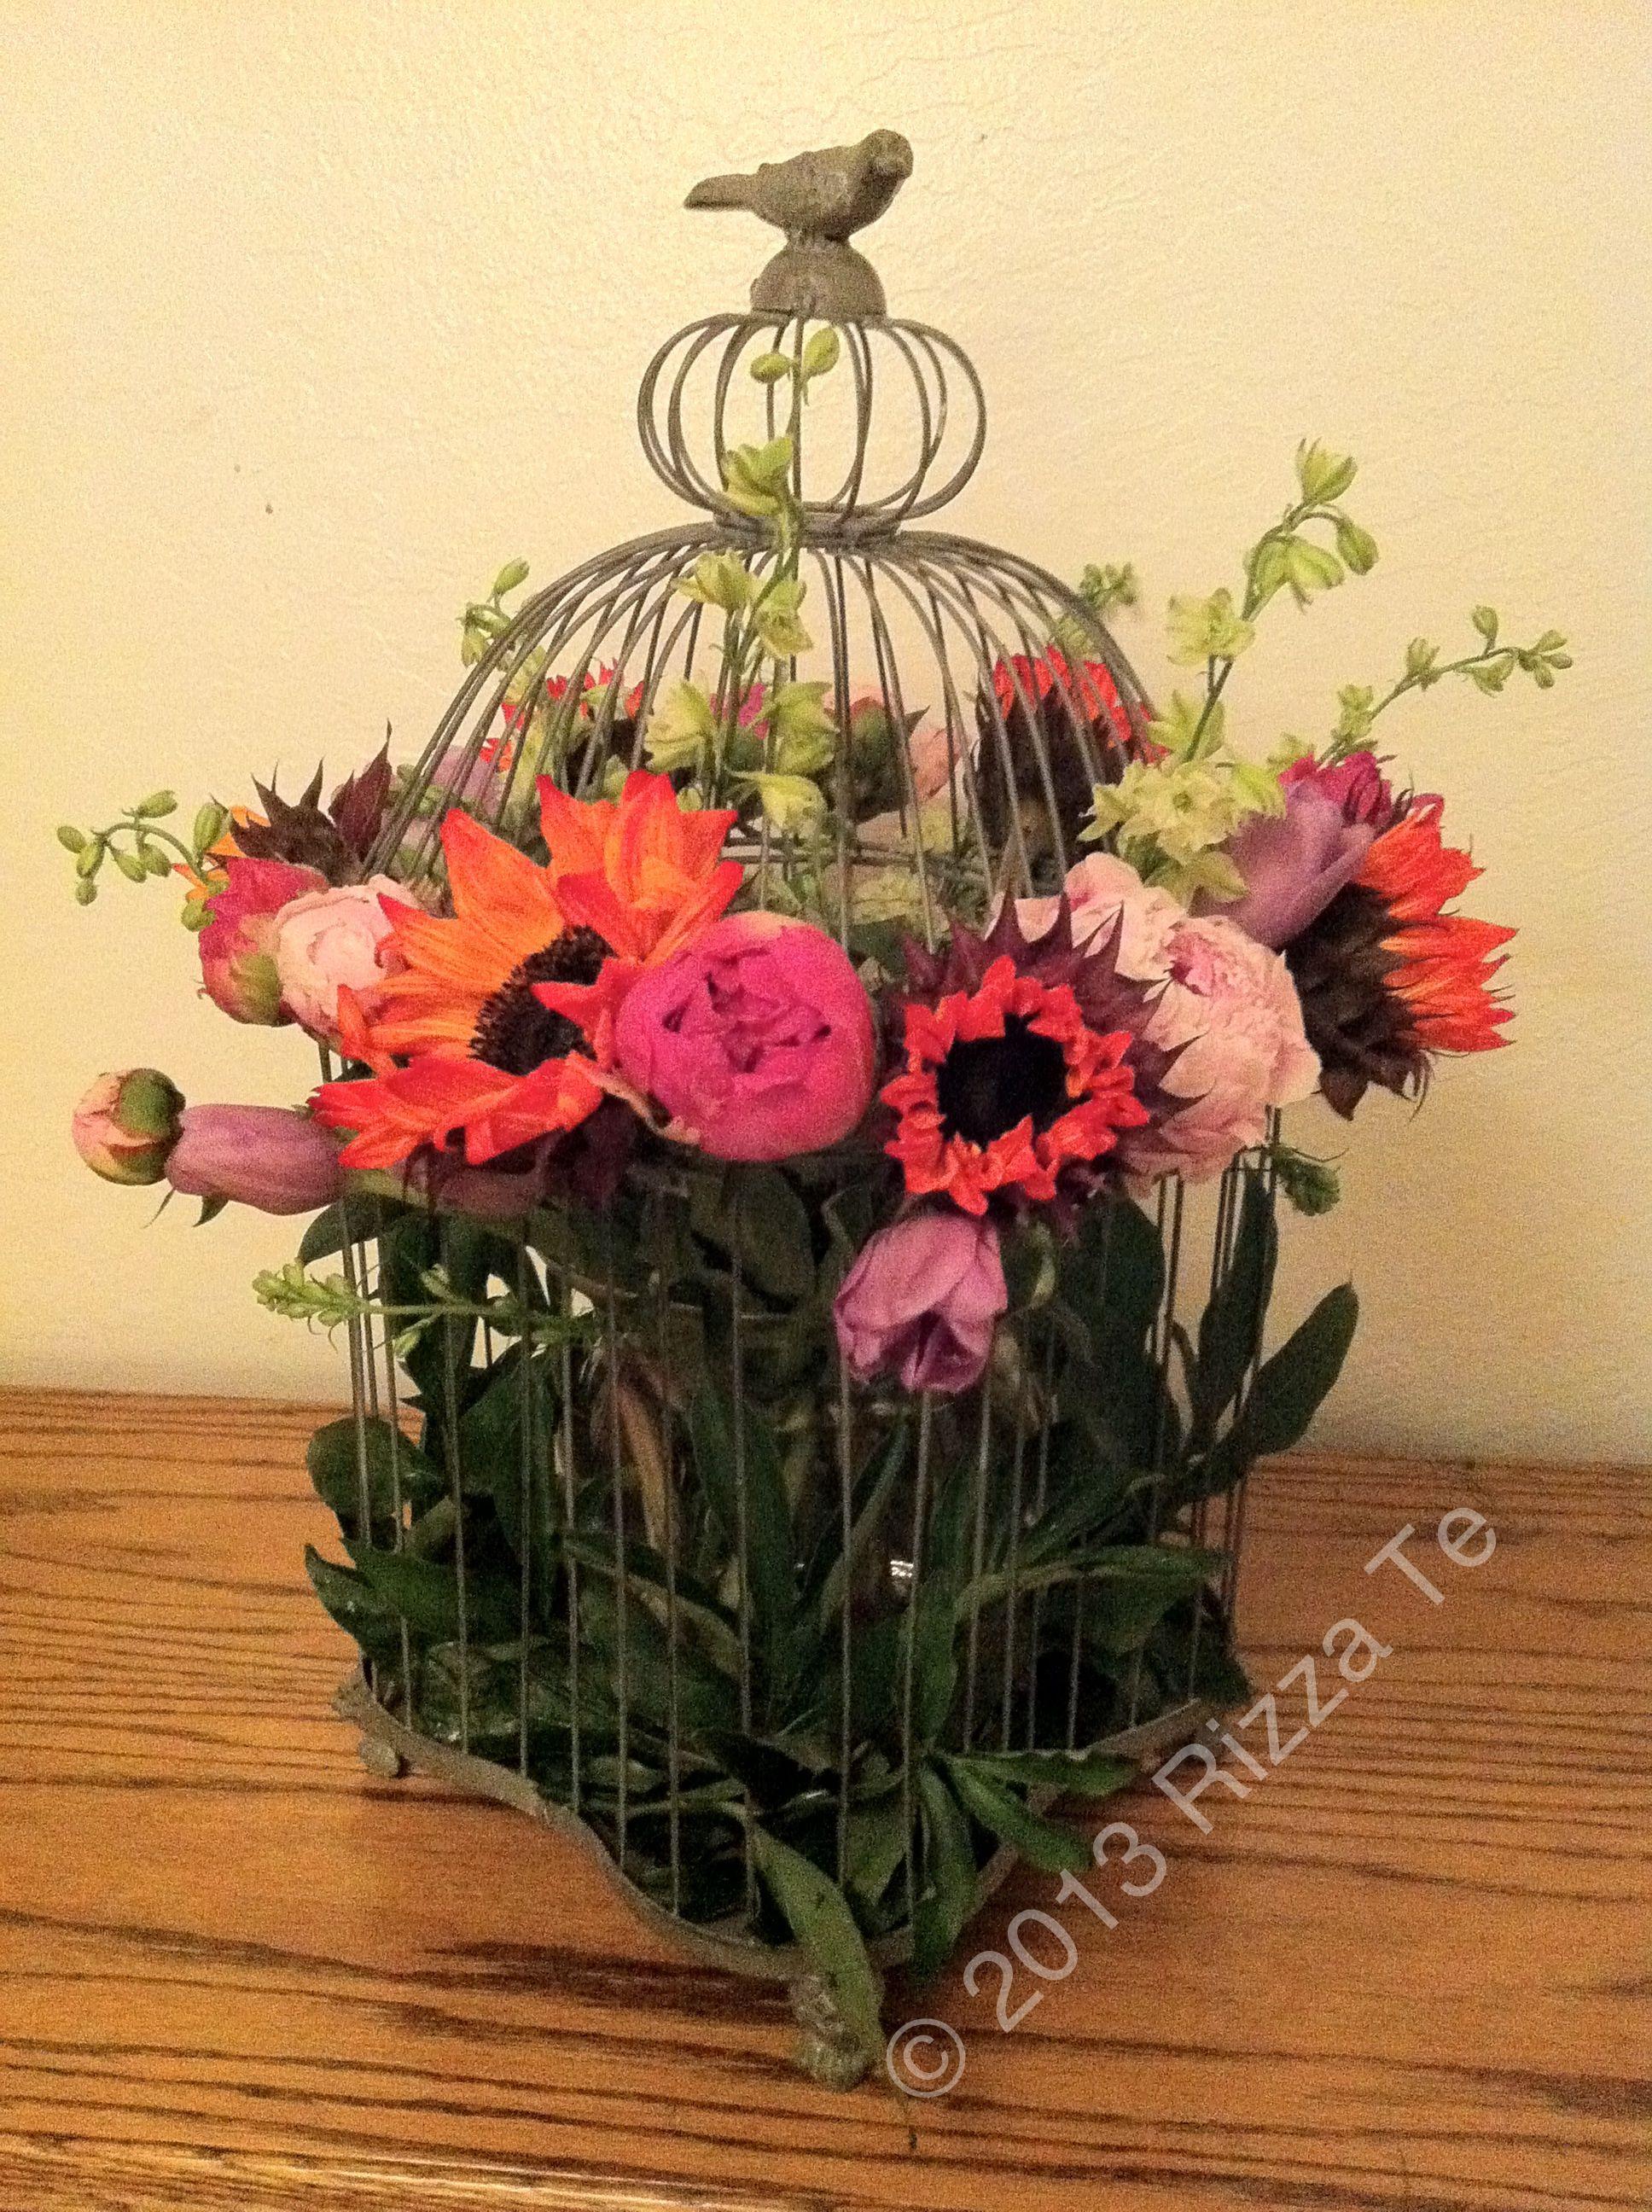 Birdcage Blooms #floralarrangement #peony #sunflower #tulip #birdcage #diy #creative